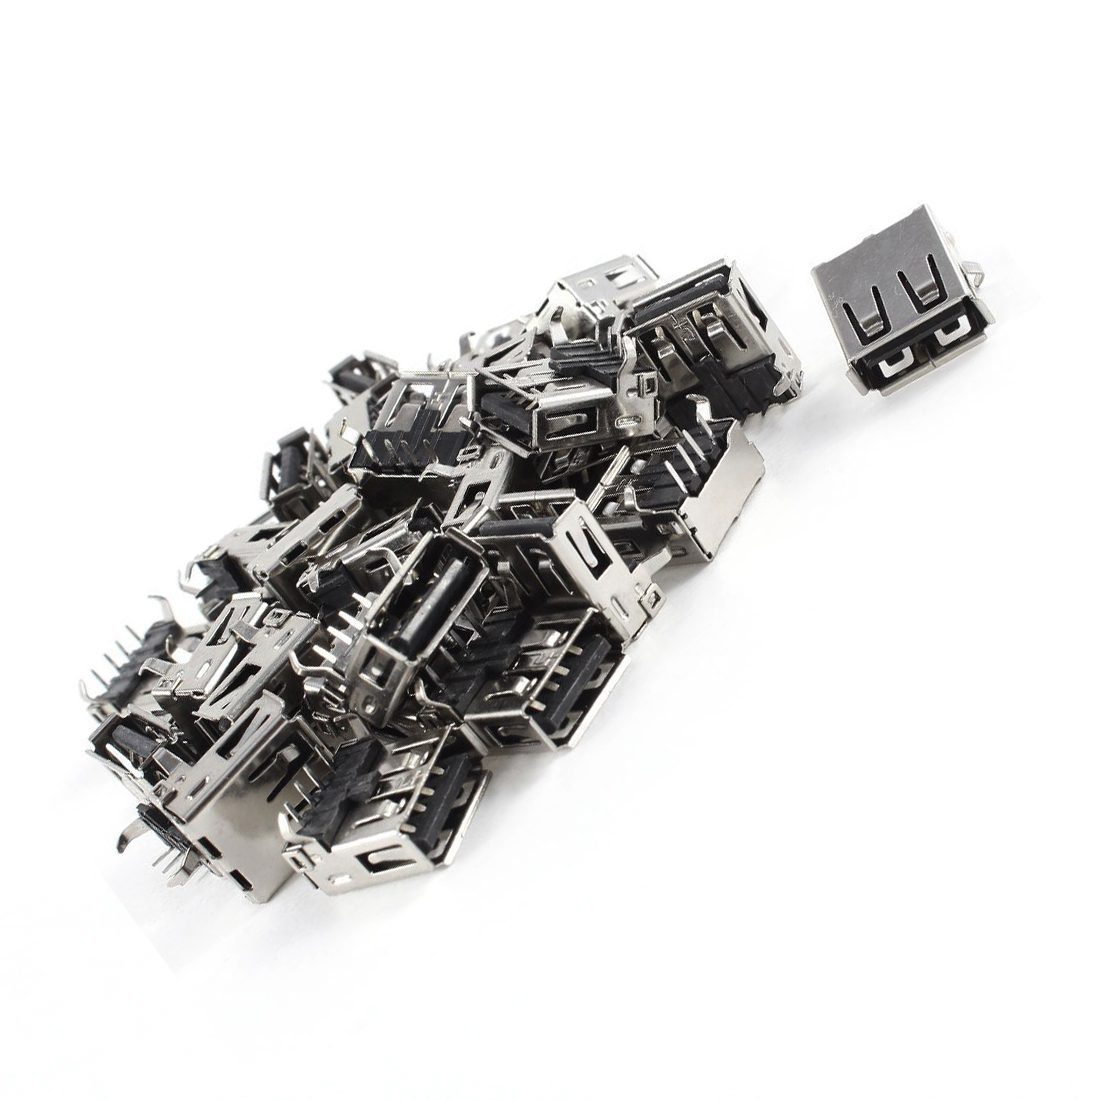 CES Hot 30 Pcs 15mm USB 2.0 Female Type A Port 4-Pin DIP 90 Degree Jack Socket Black+Silver